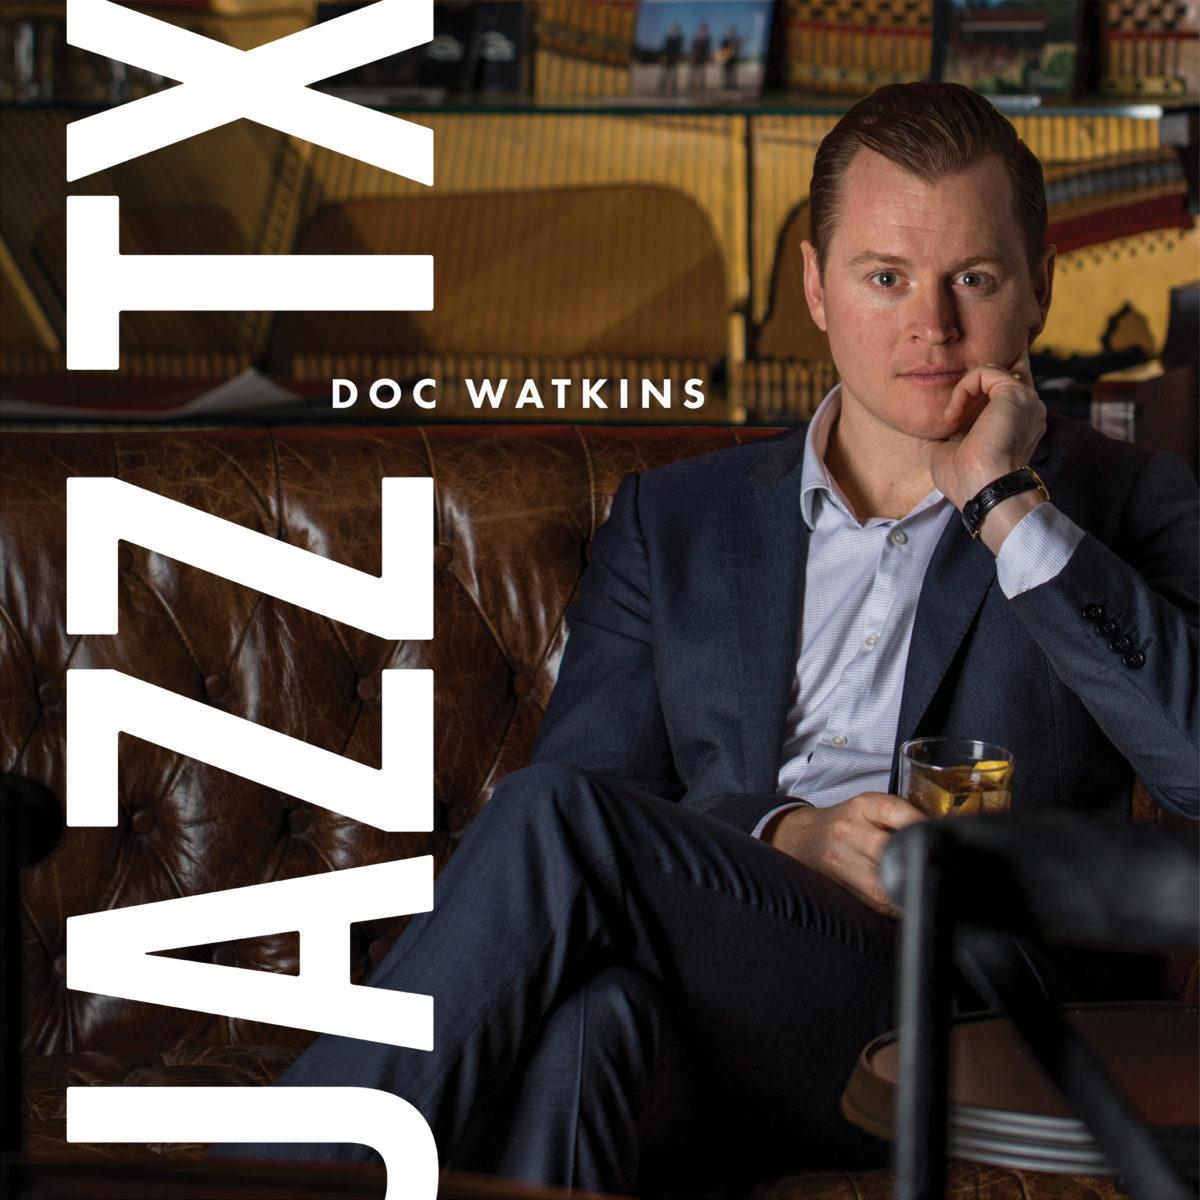 docwatkins-jazztx-cover-2048x2048-1200x1200.jpg